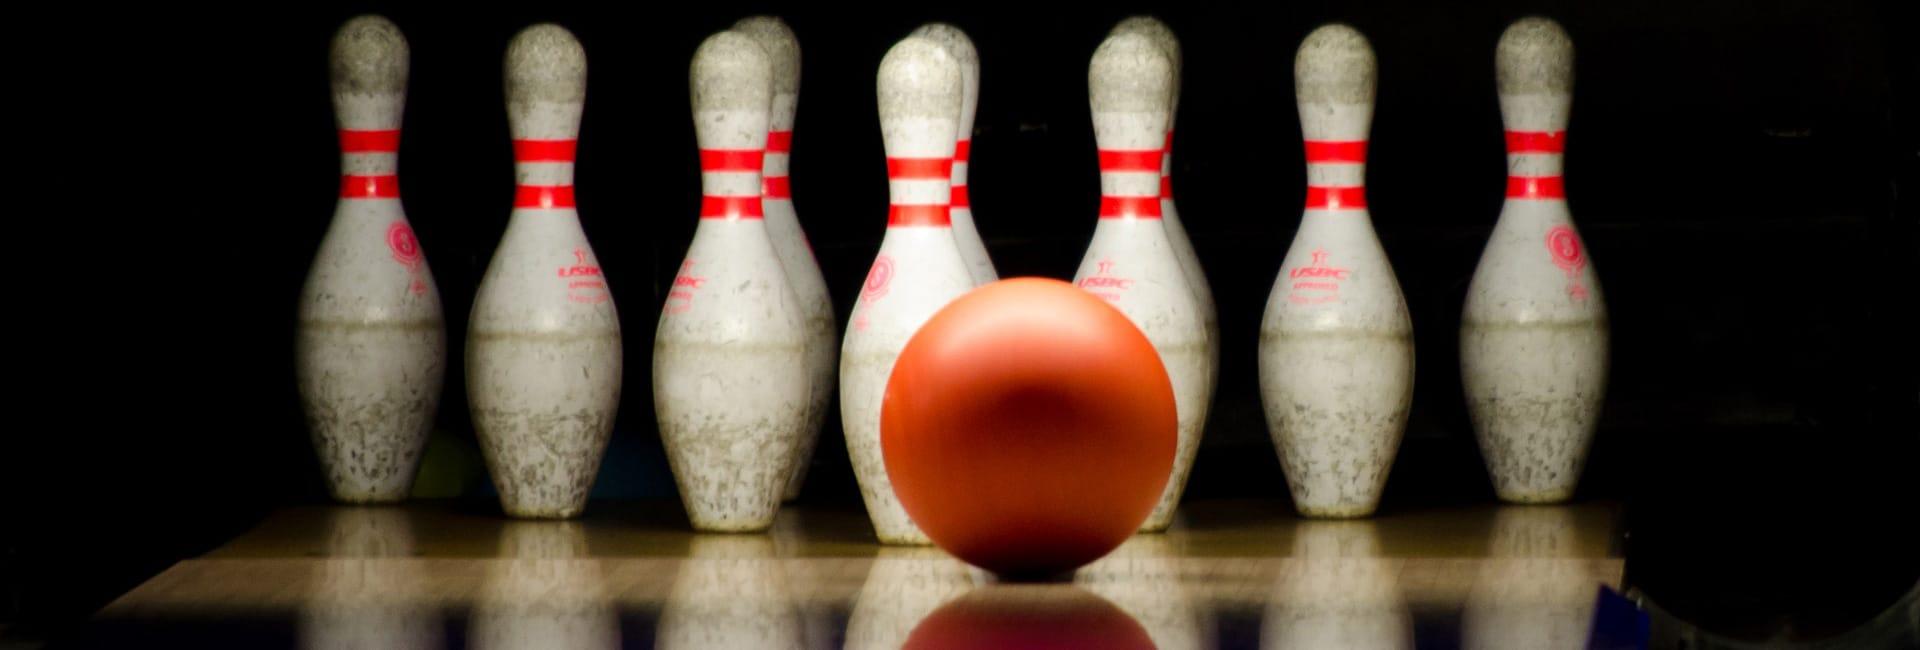 bowling turnering citybowling